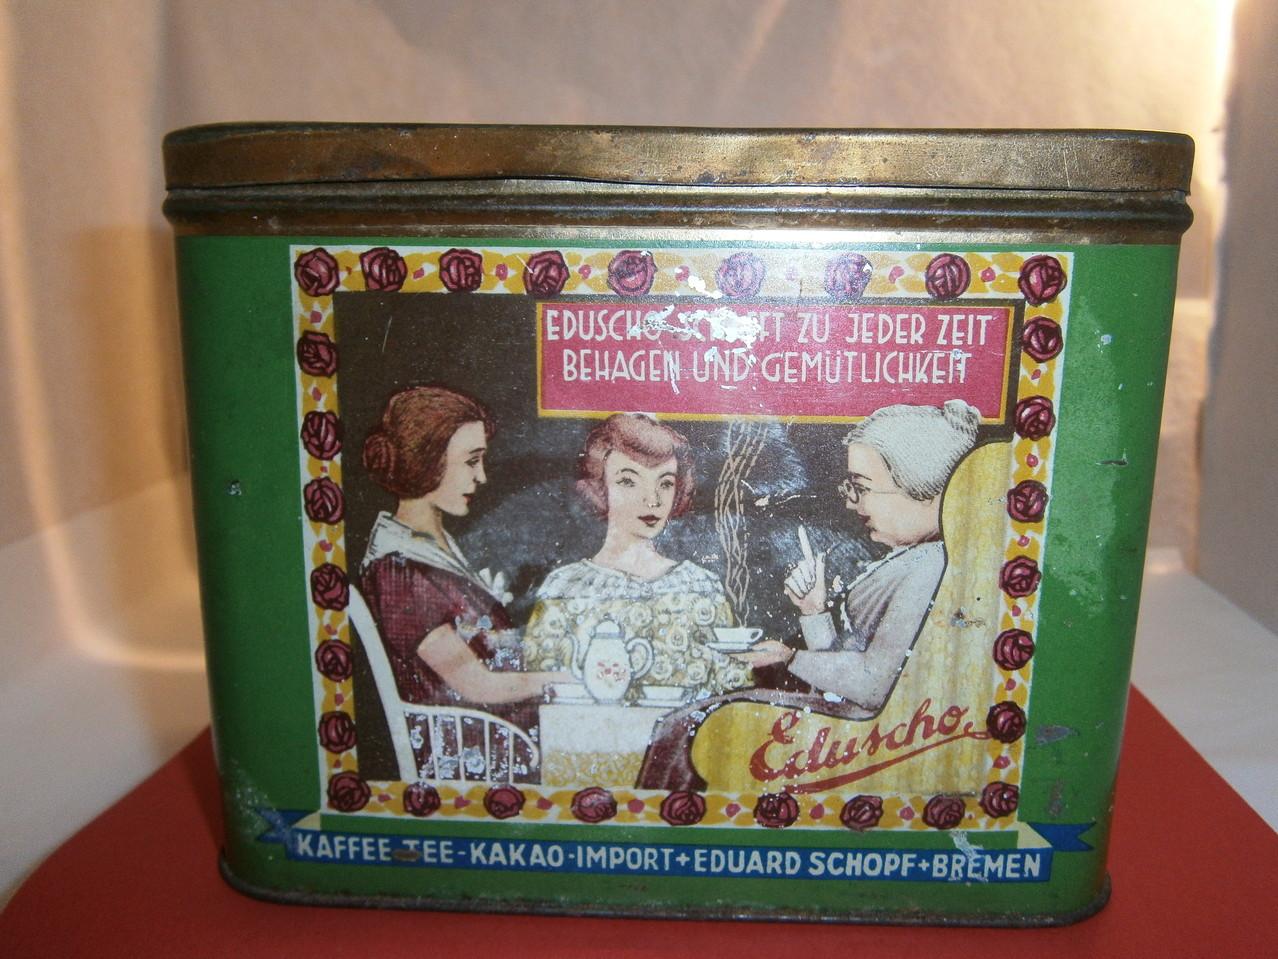 Eduscho Kaffeedose um 1930